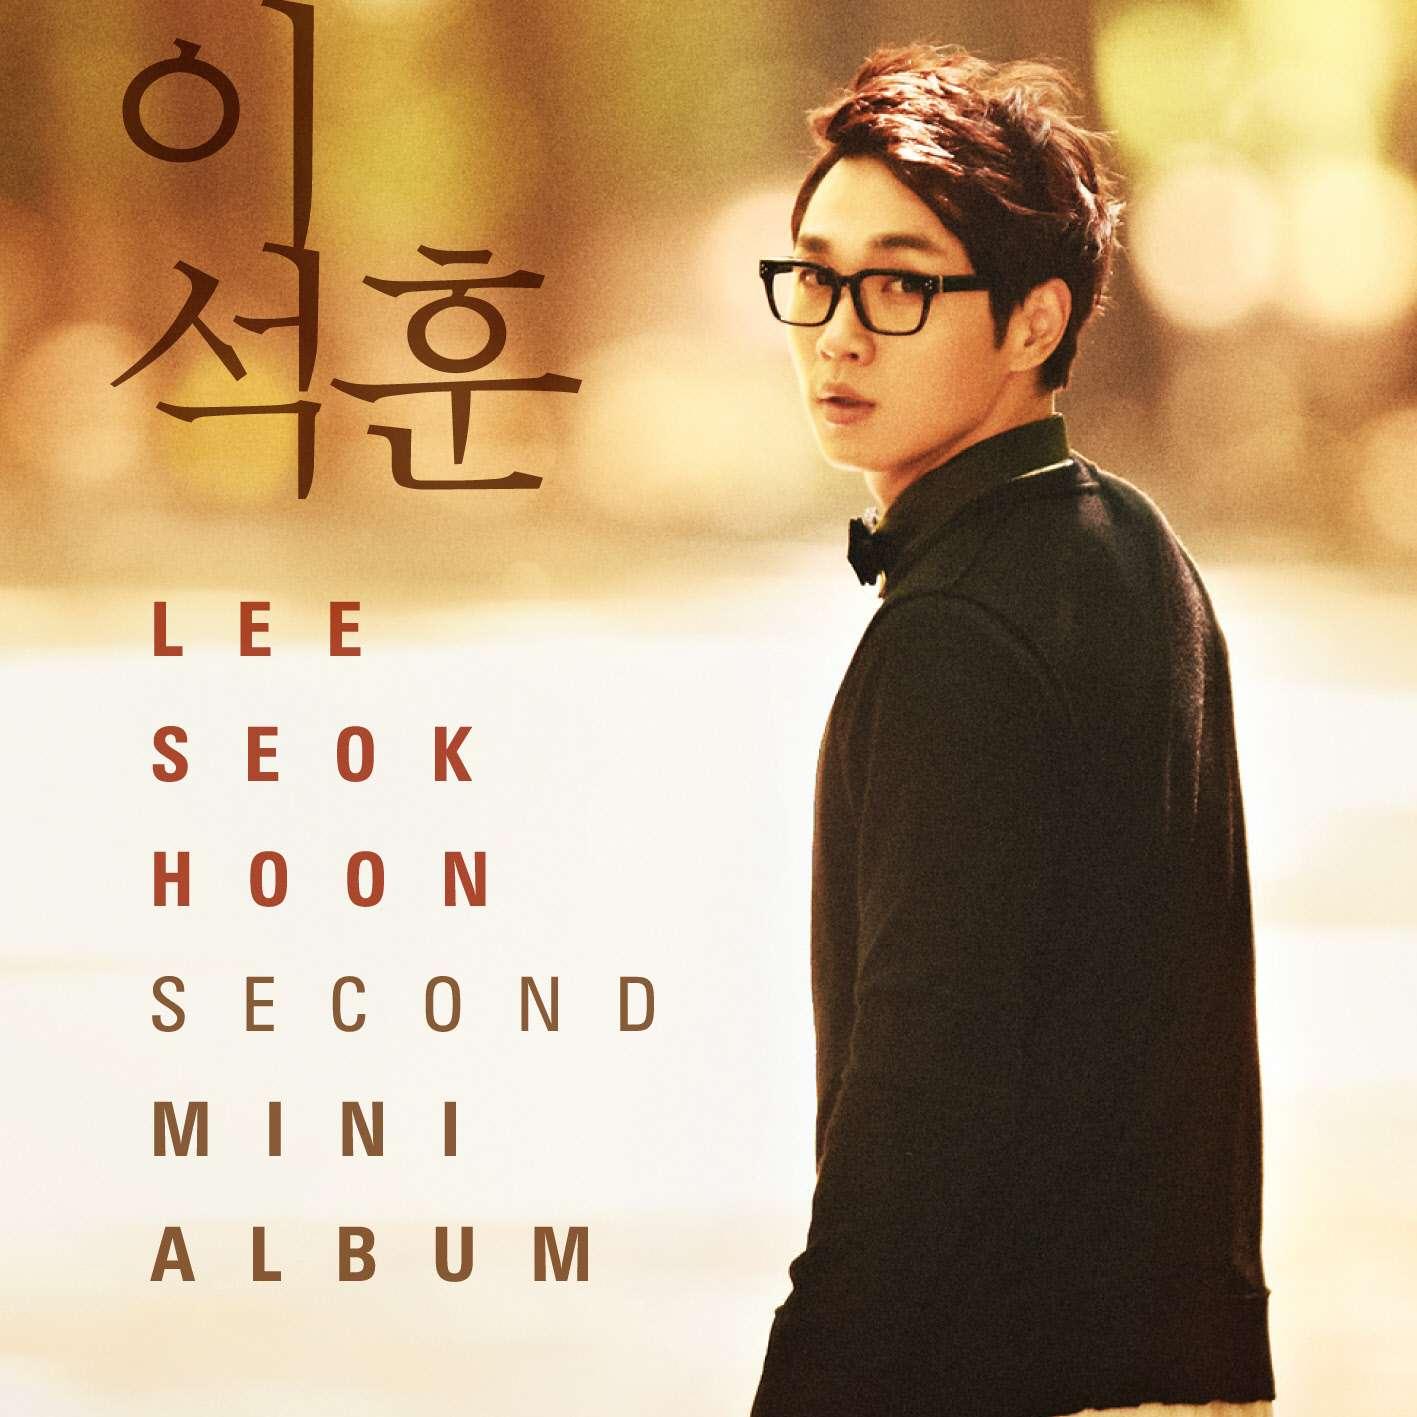 [Mini Album] Lee Seok Hoon (SG Wannabe) - Different Hello